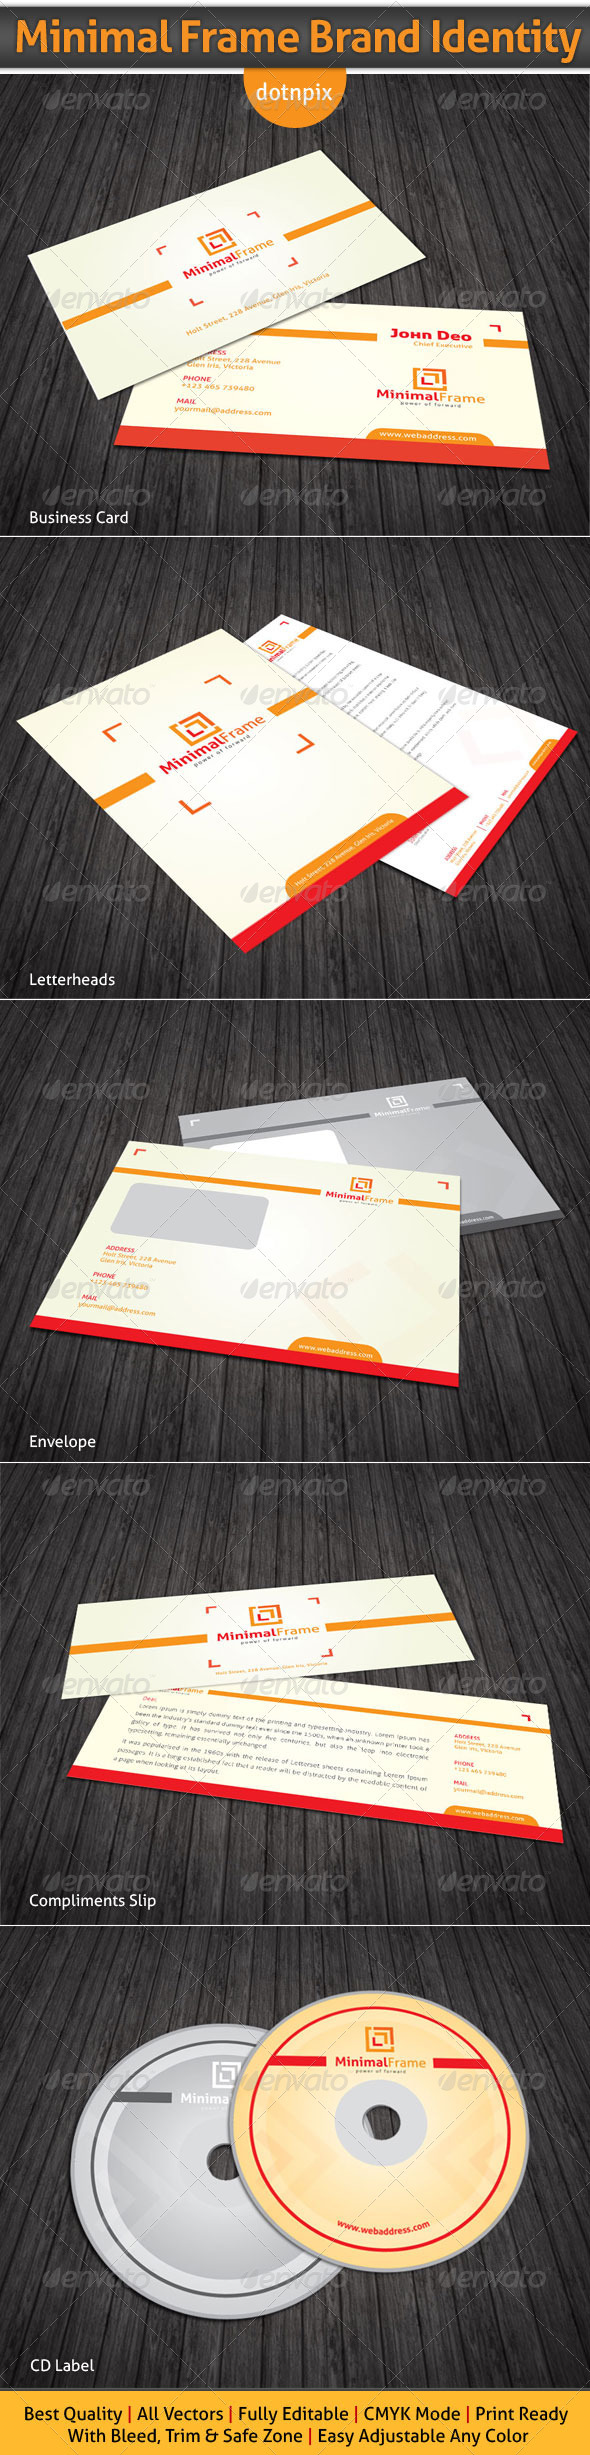 Minimal Frame Brand Identity - Stationery Print Templates